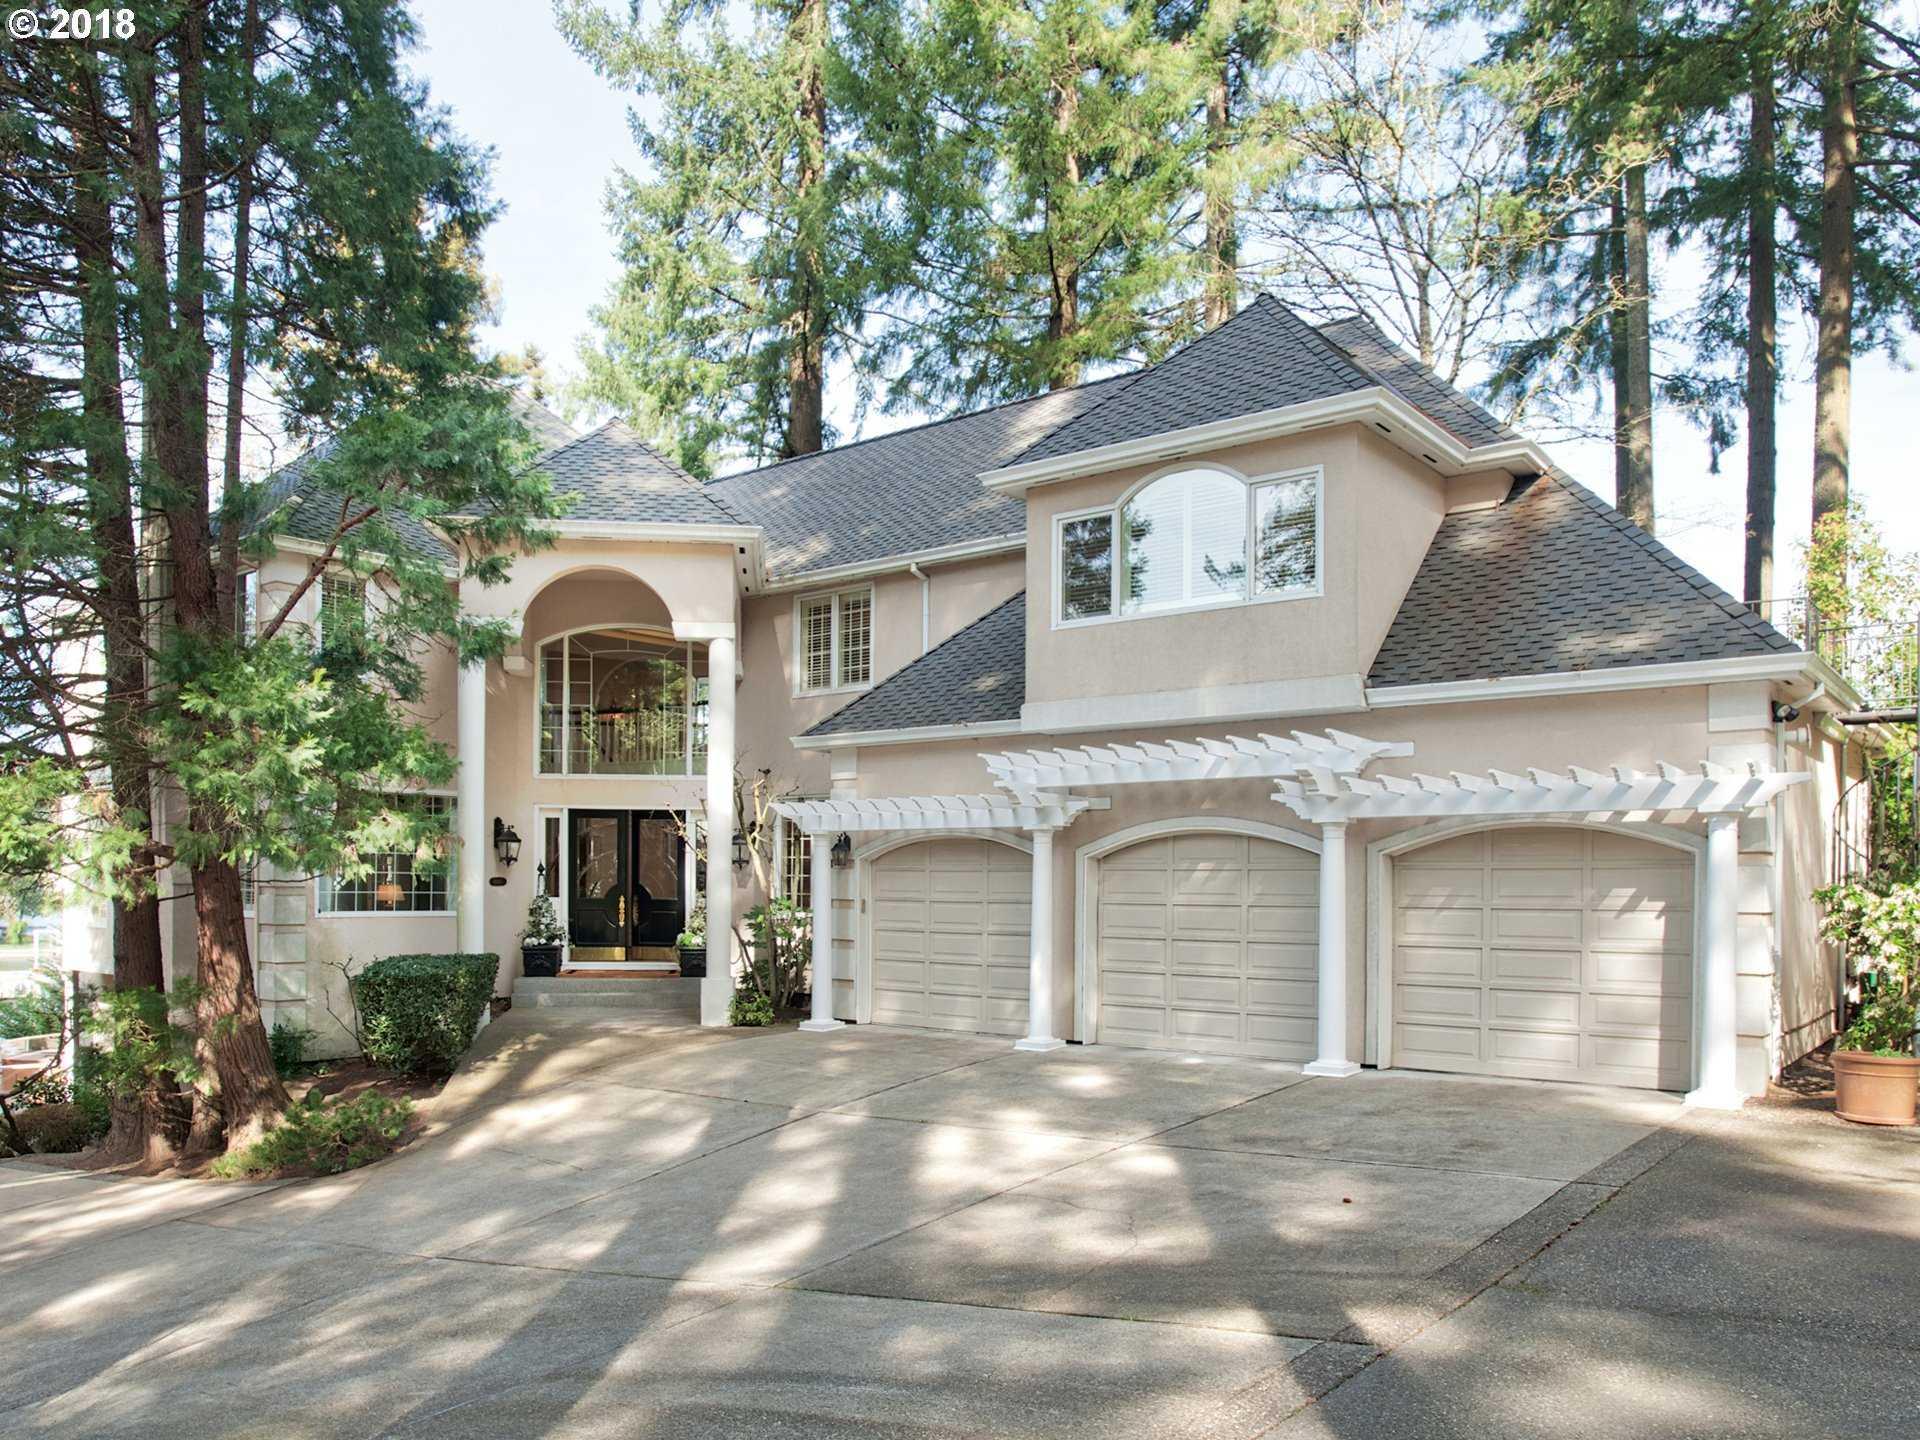 $2,595,000 - 5Br/5Ba -  for Sale in Lake View Villas 06, Lake Oswego